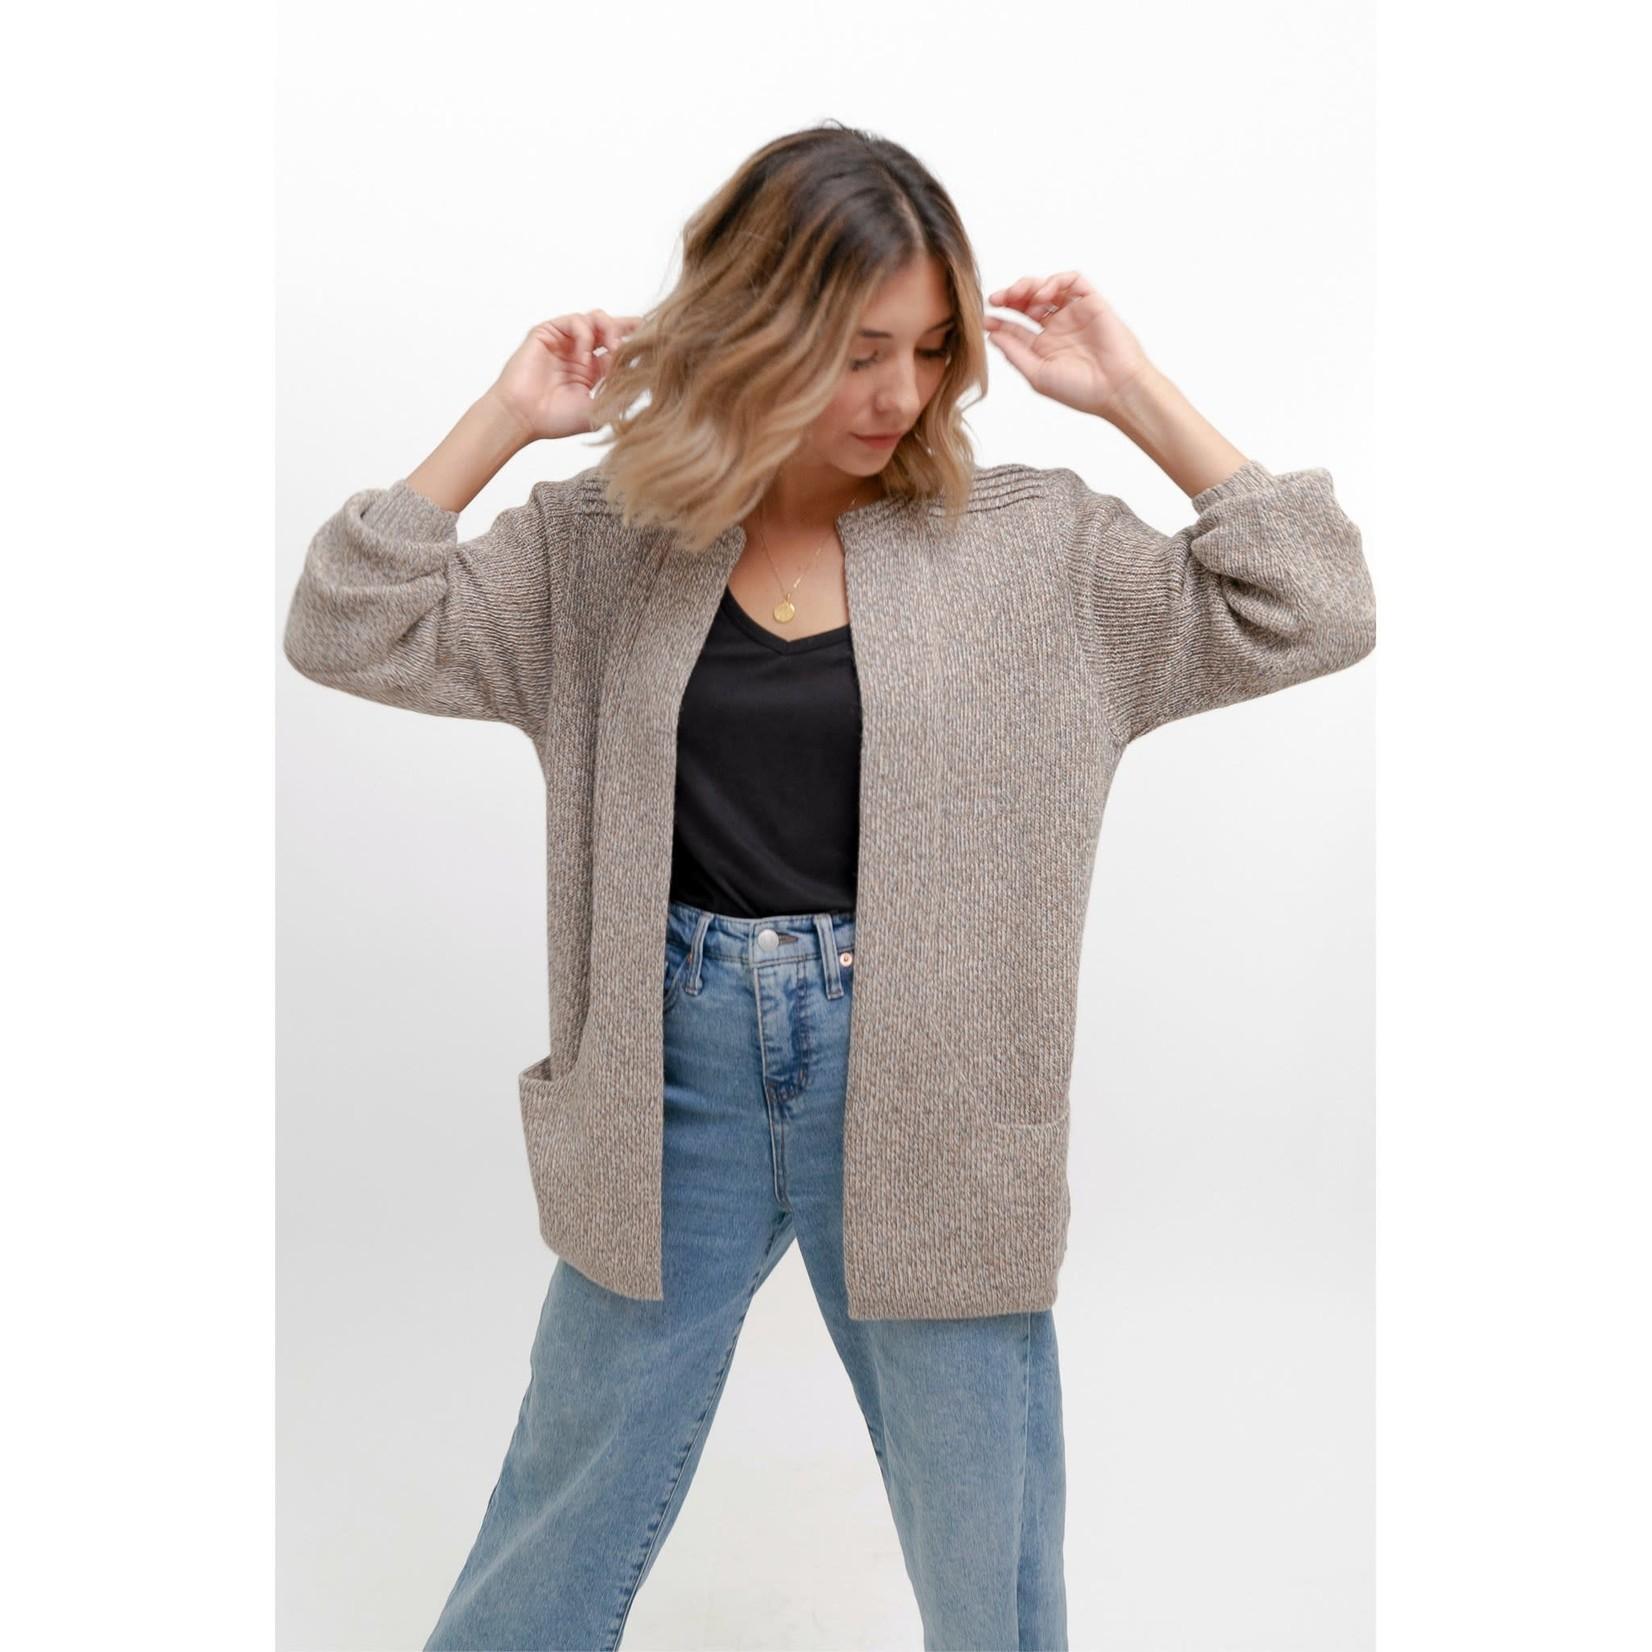 Pokoloko Alpaca Cartier Sweater